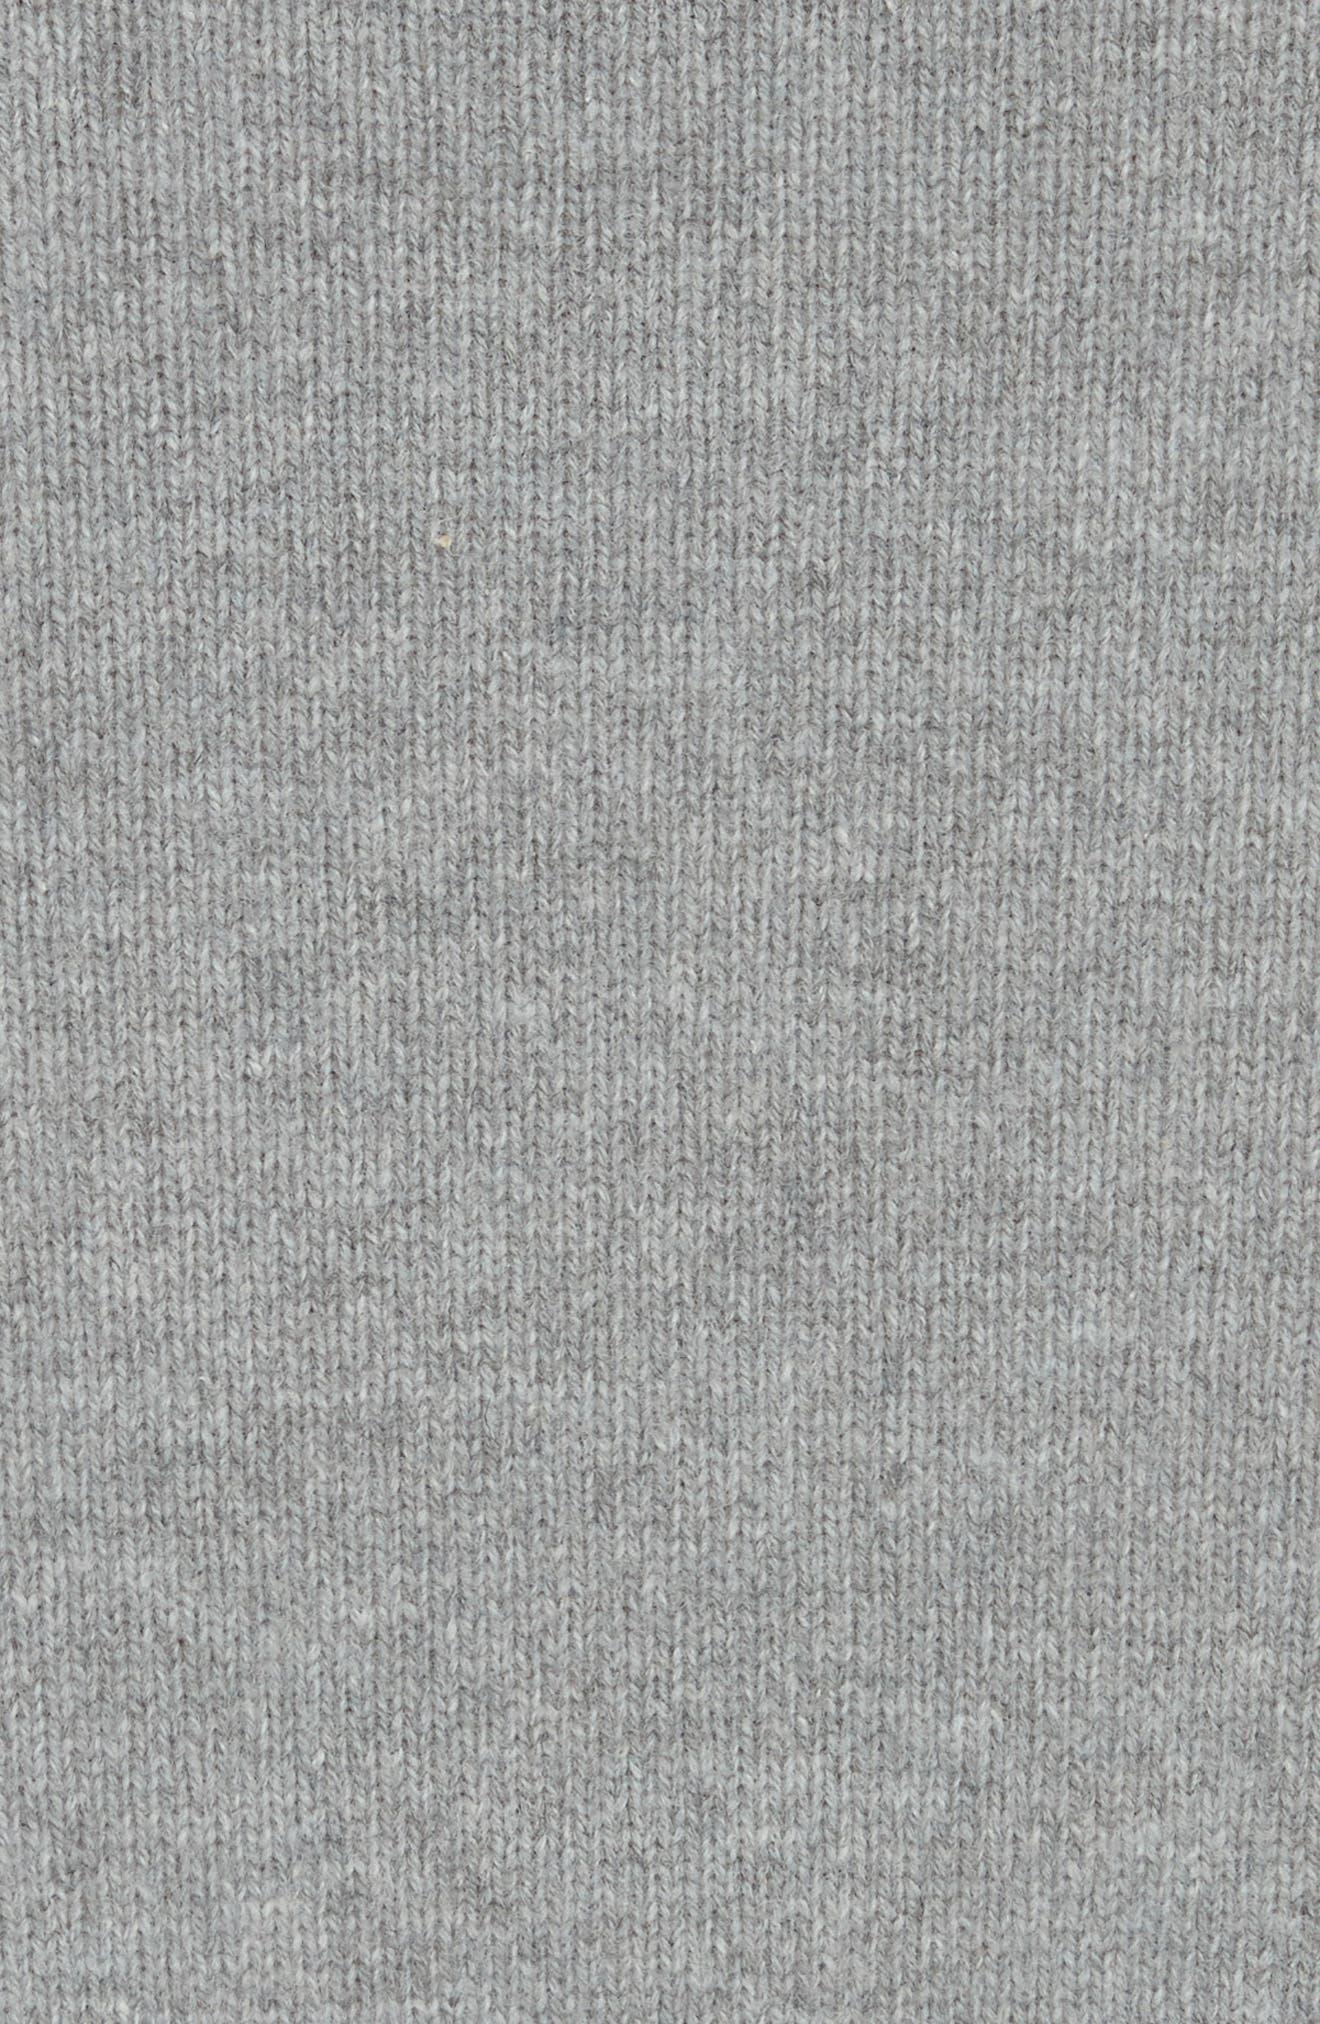 Rainbow Stripe Merino Wool Blend Sweater,                             Alternate thumbnail 5, color,                             MEDIUM GREY MELANGE